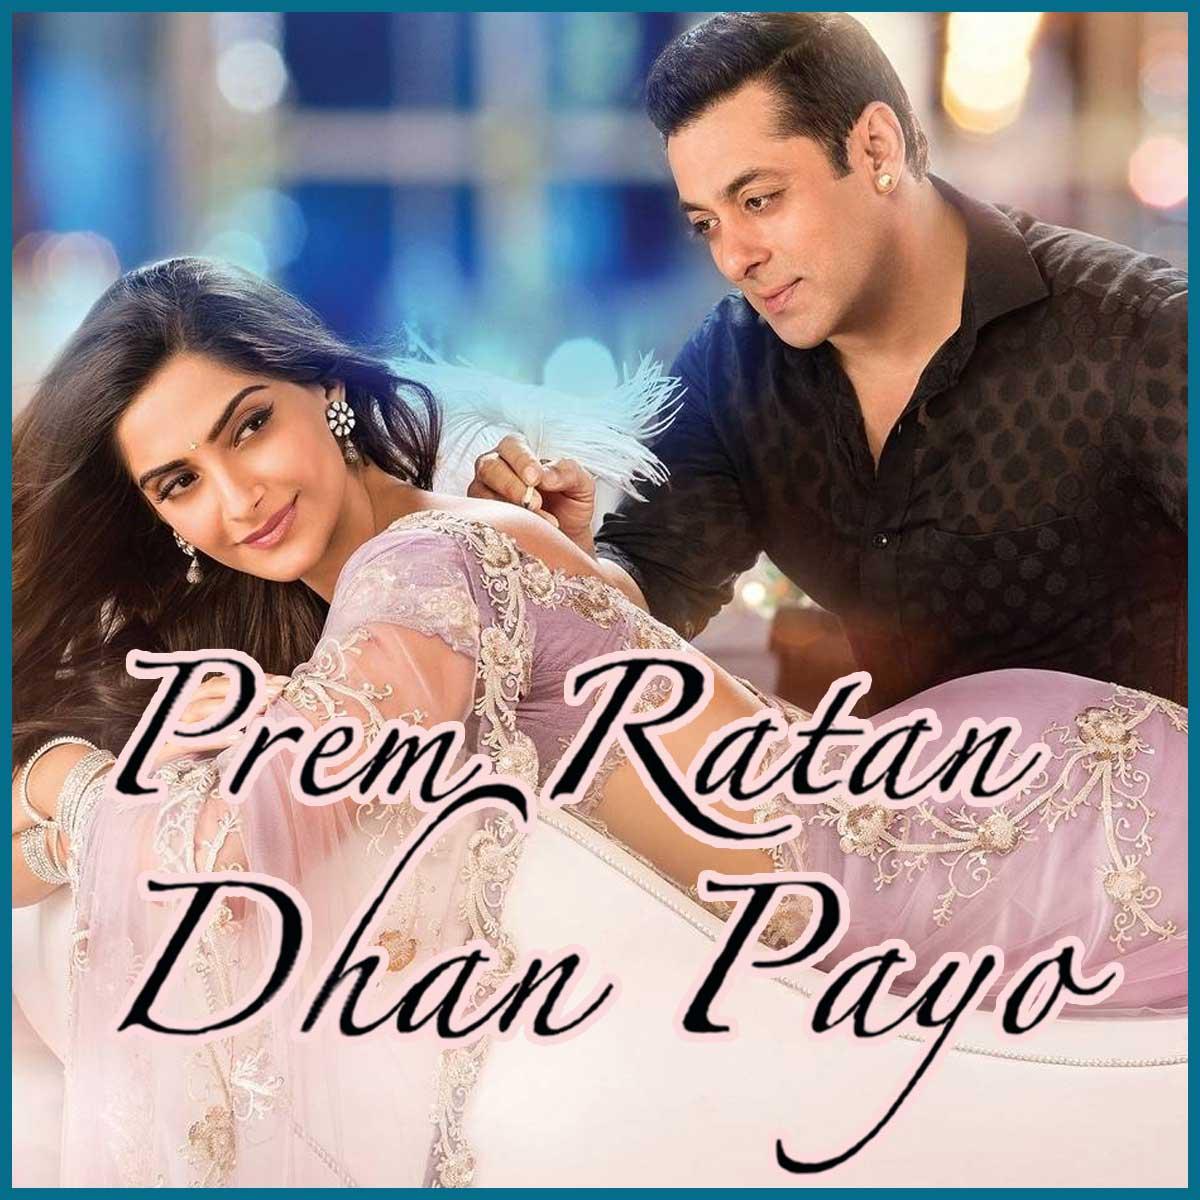 Prem ratan dhan payo full song with lyrics | prem ratan dhan payo.